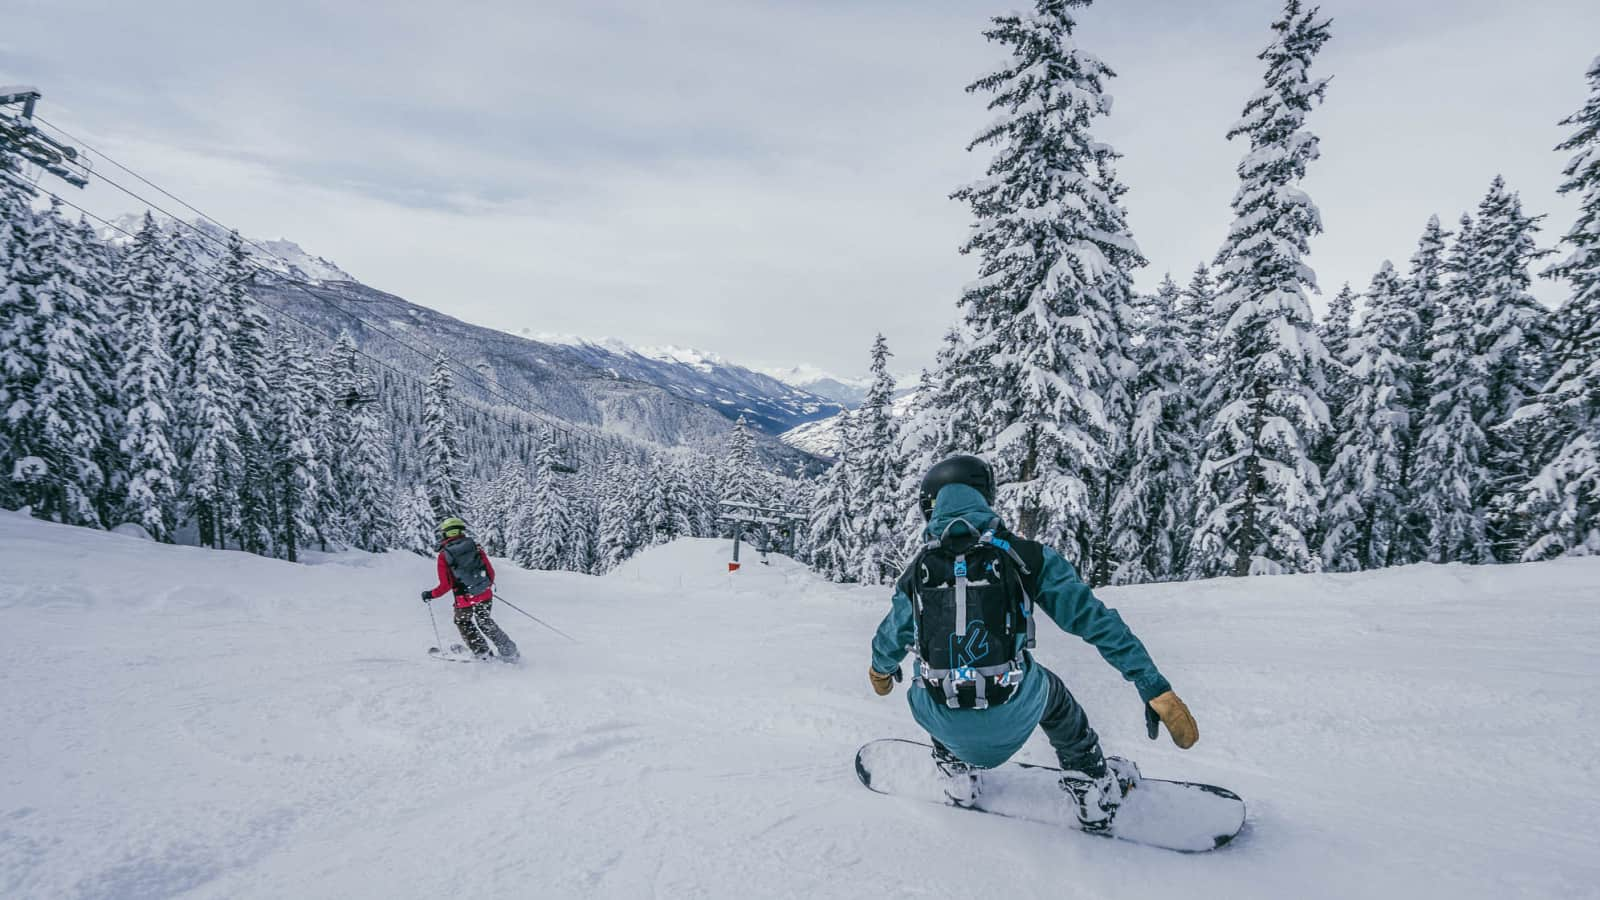 Ski holidays to france topflight irelands no1 ski operator read more keyboardarrowdown solutioingenieria Gallery